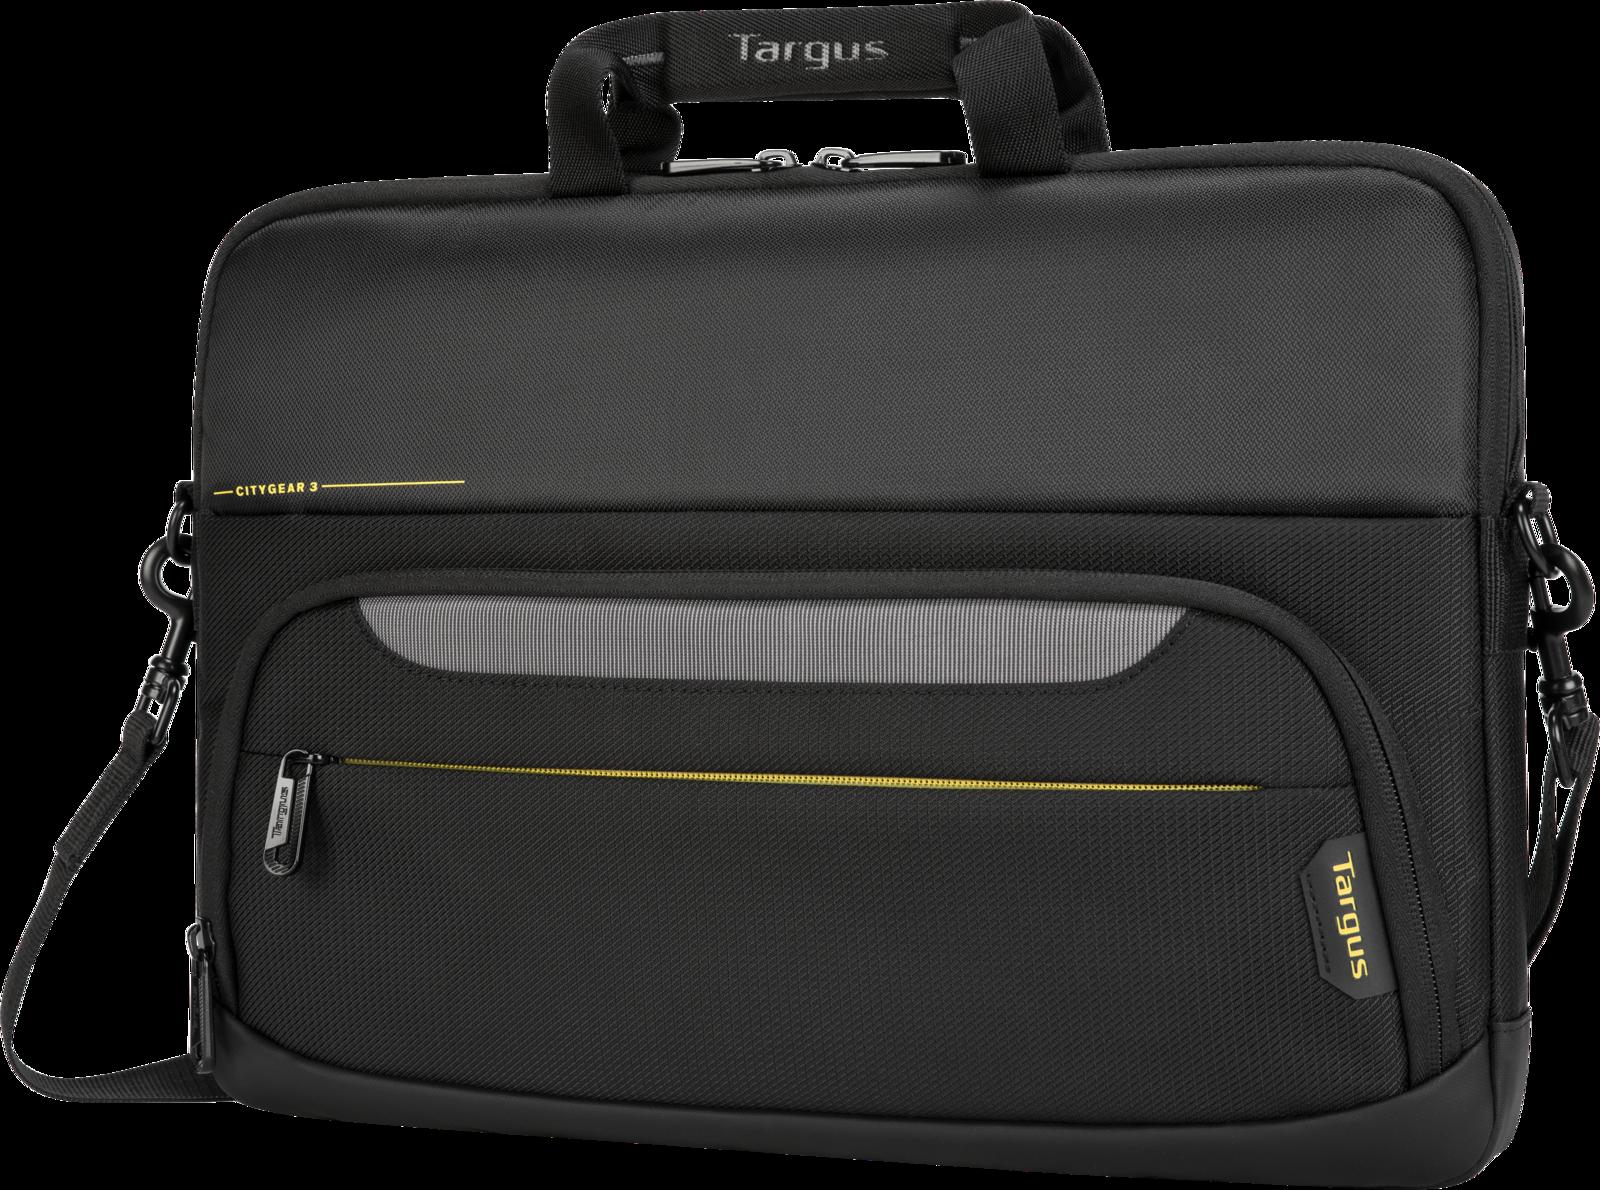 "15.6"" Targus CityGear 3 Slimlite Laptop Case image"